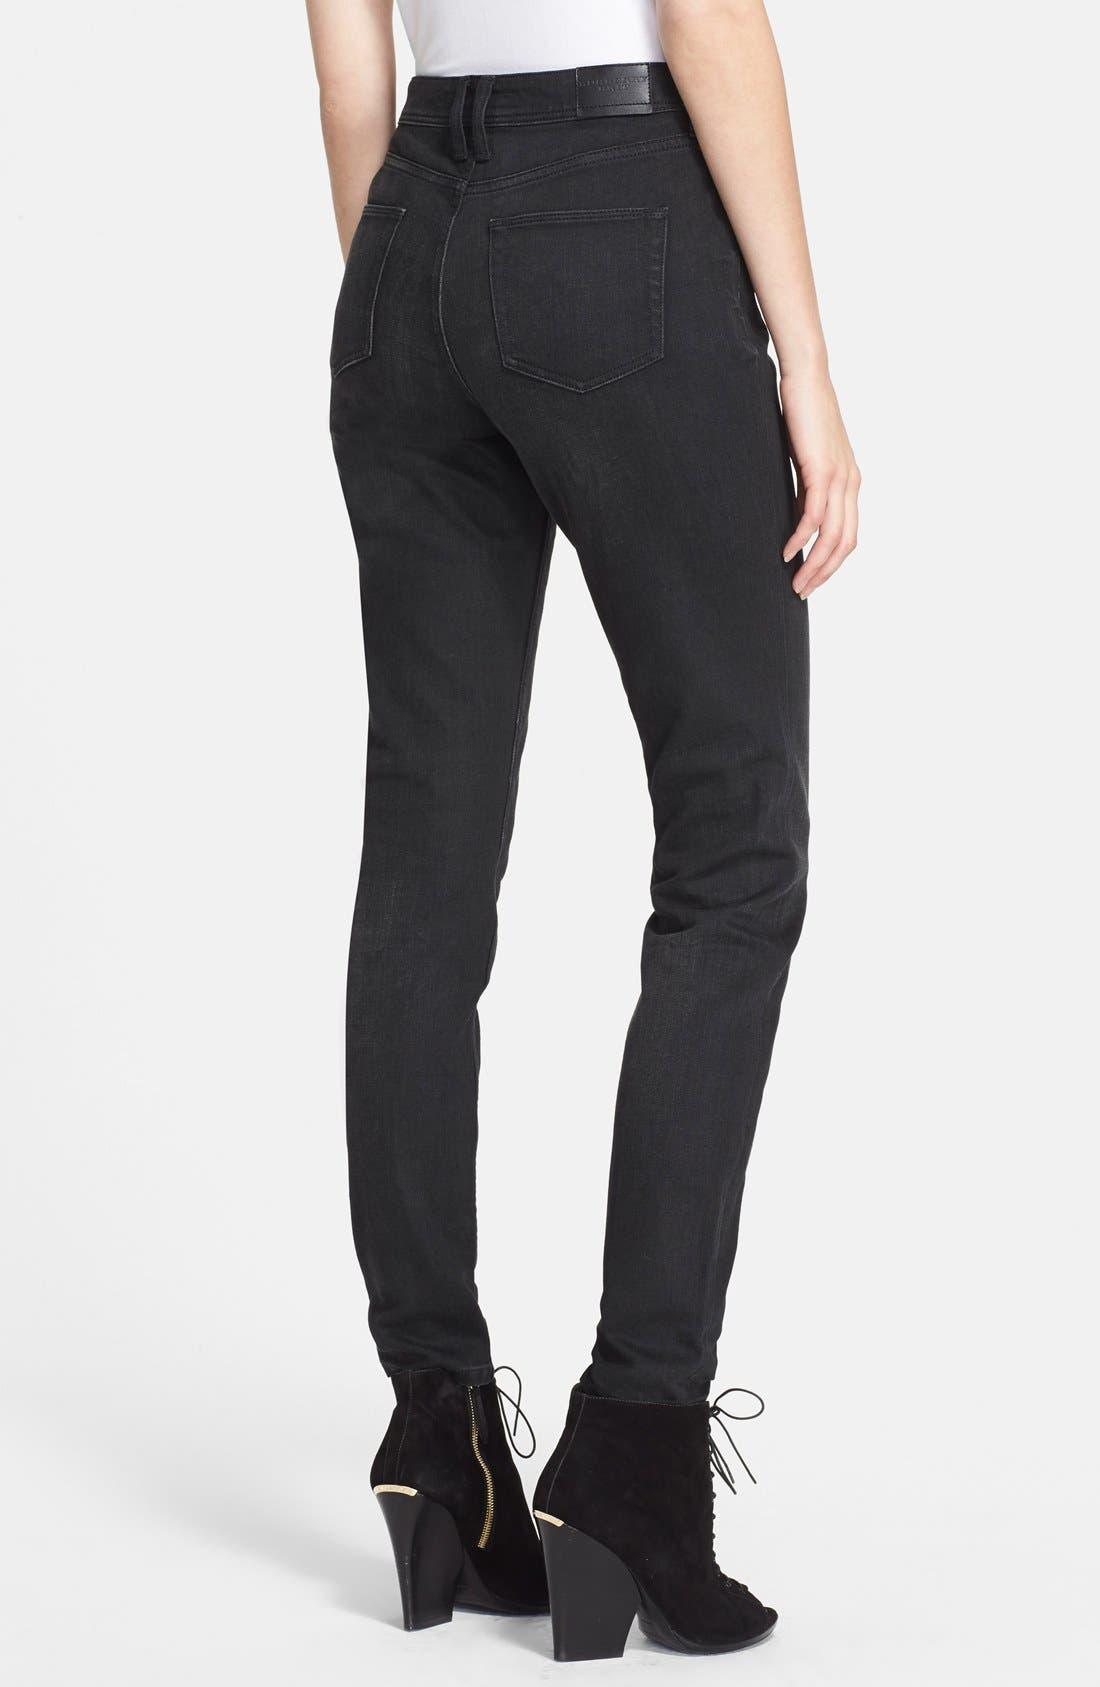 BURBERRY BRIT, Skinny Jeans, Alternate thumbnail 2, color, 001